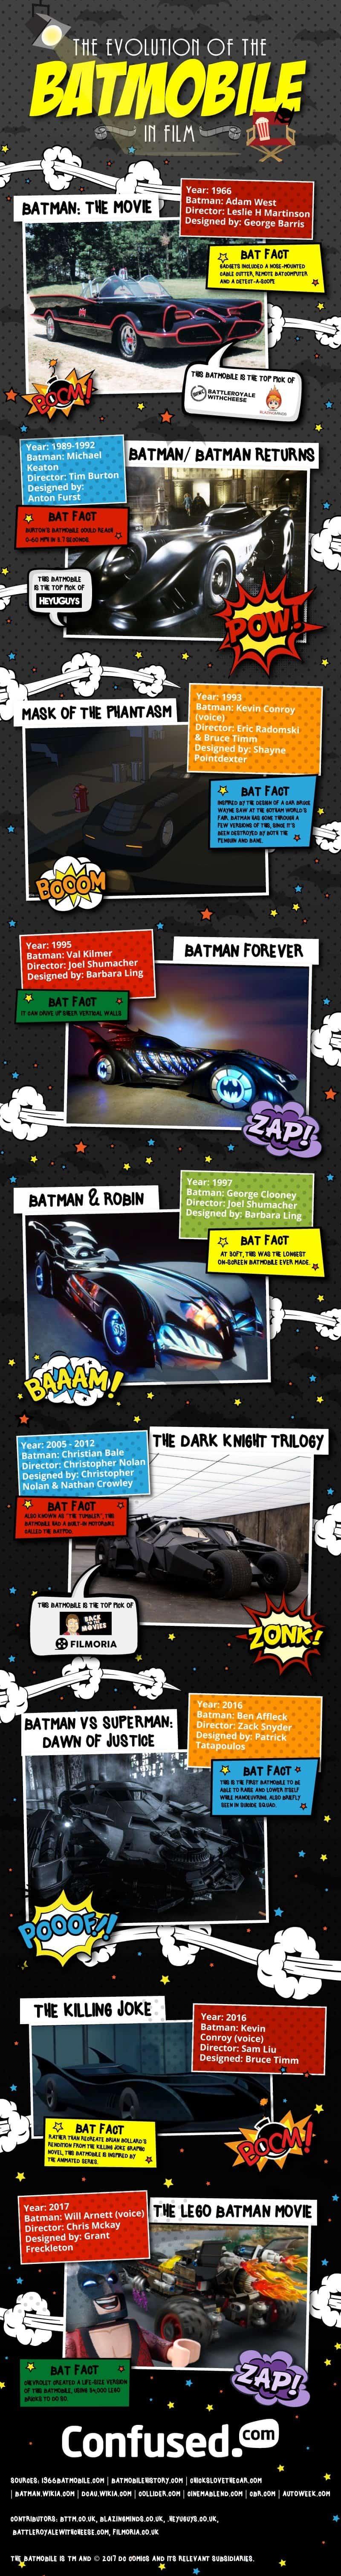 batmobile-evolution